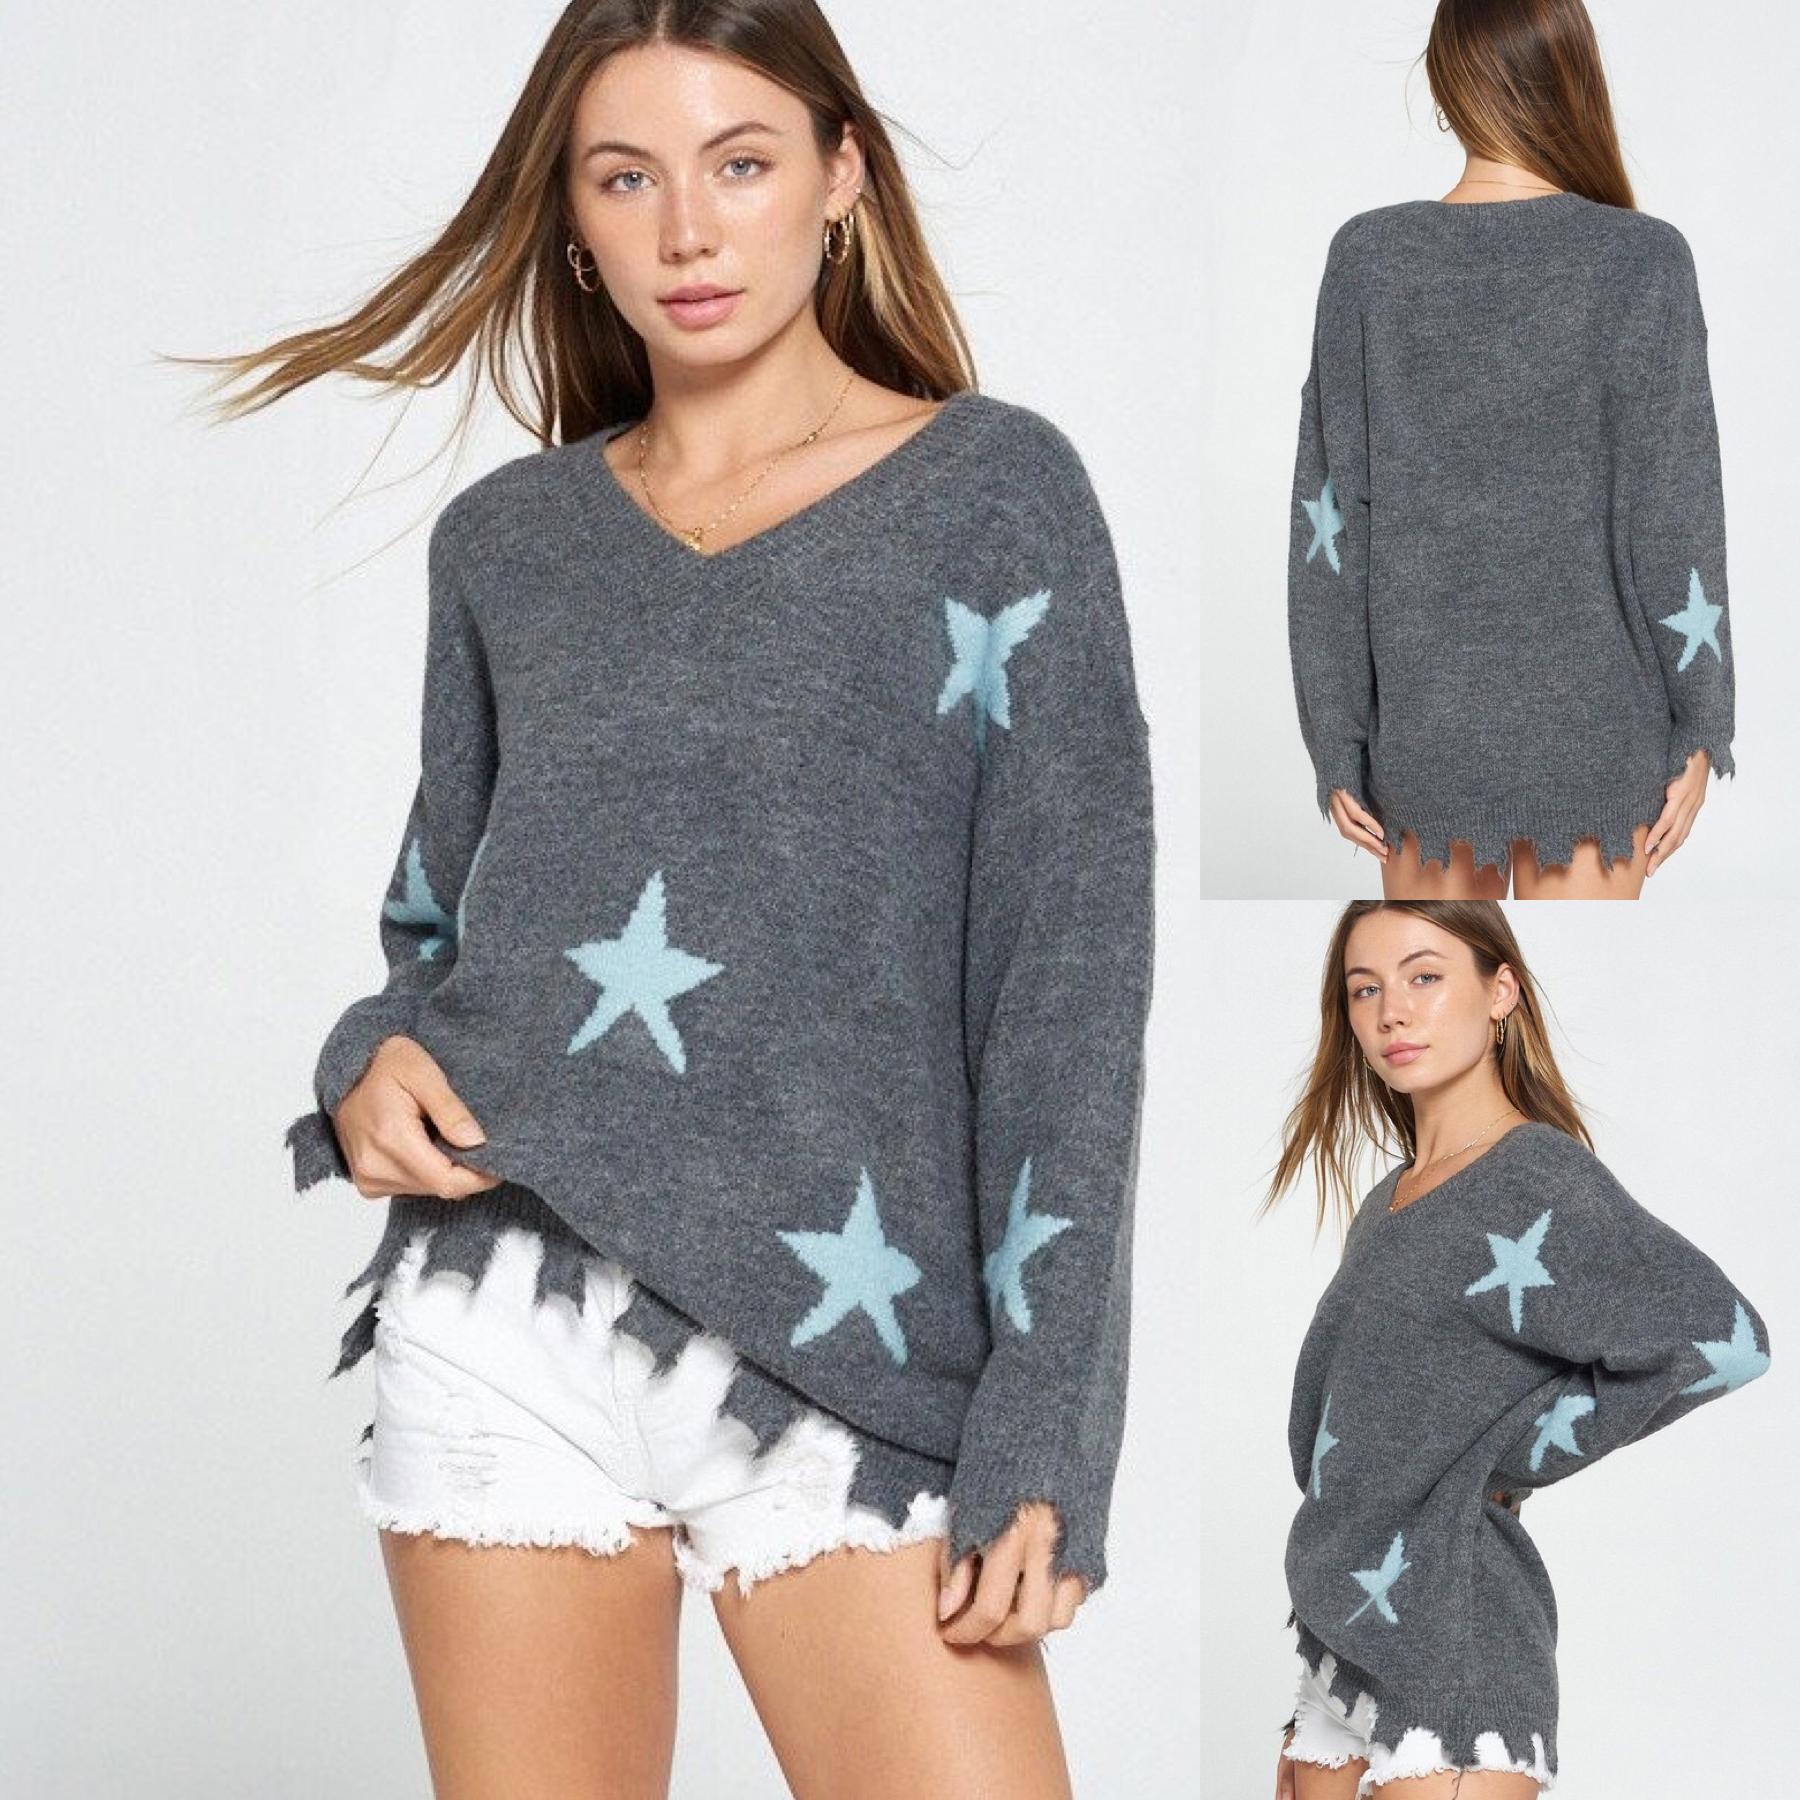 Oversized Star Print Sweater